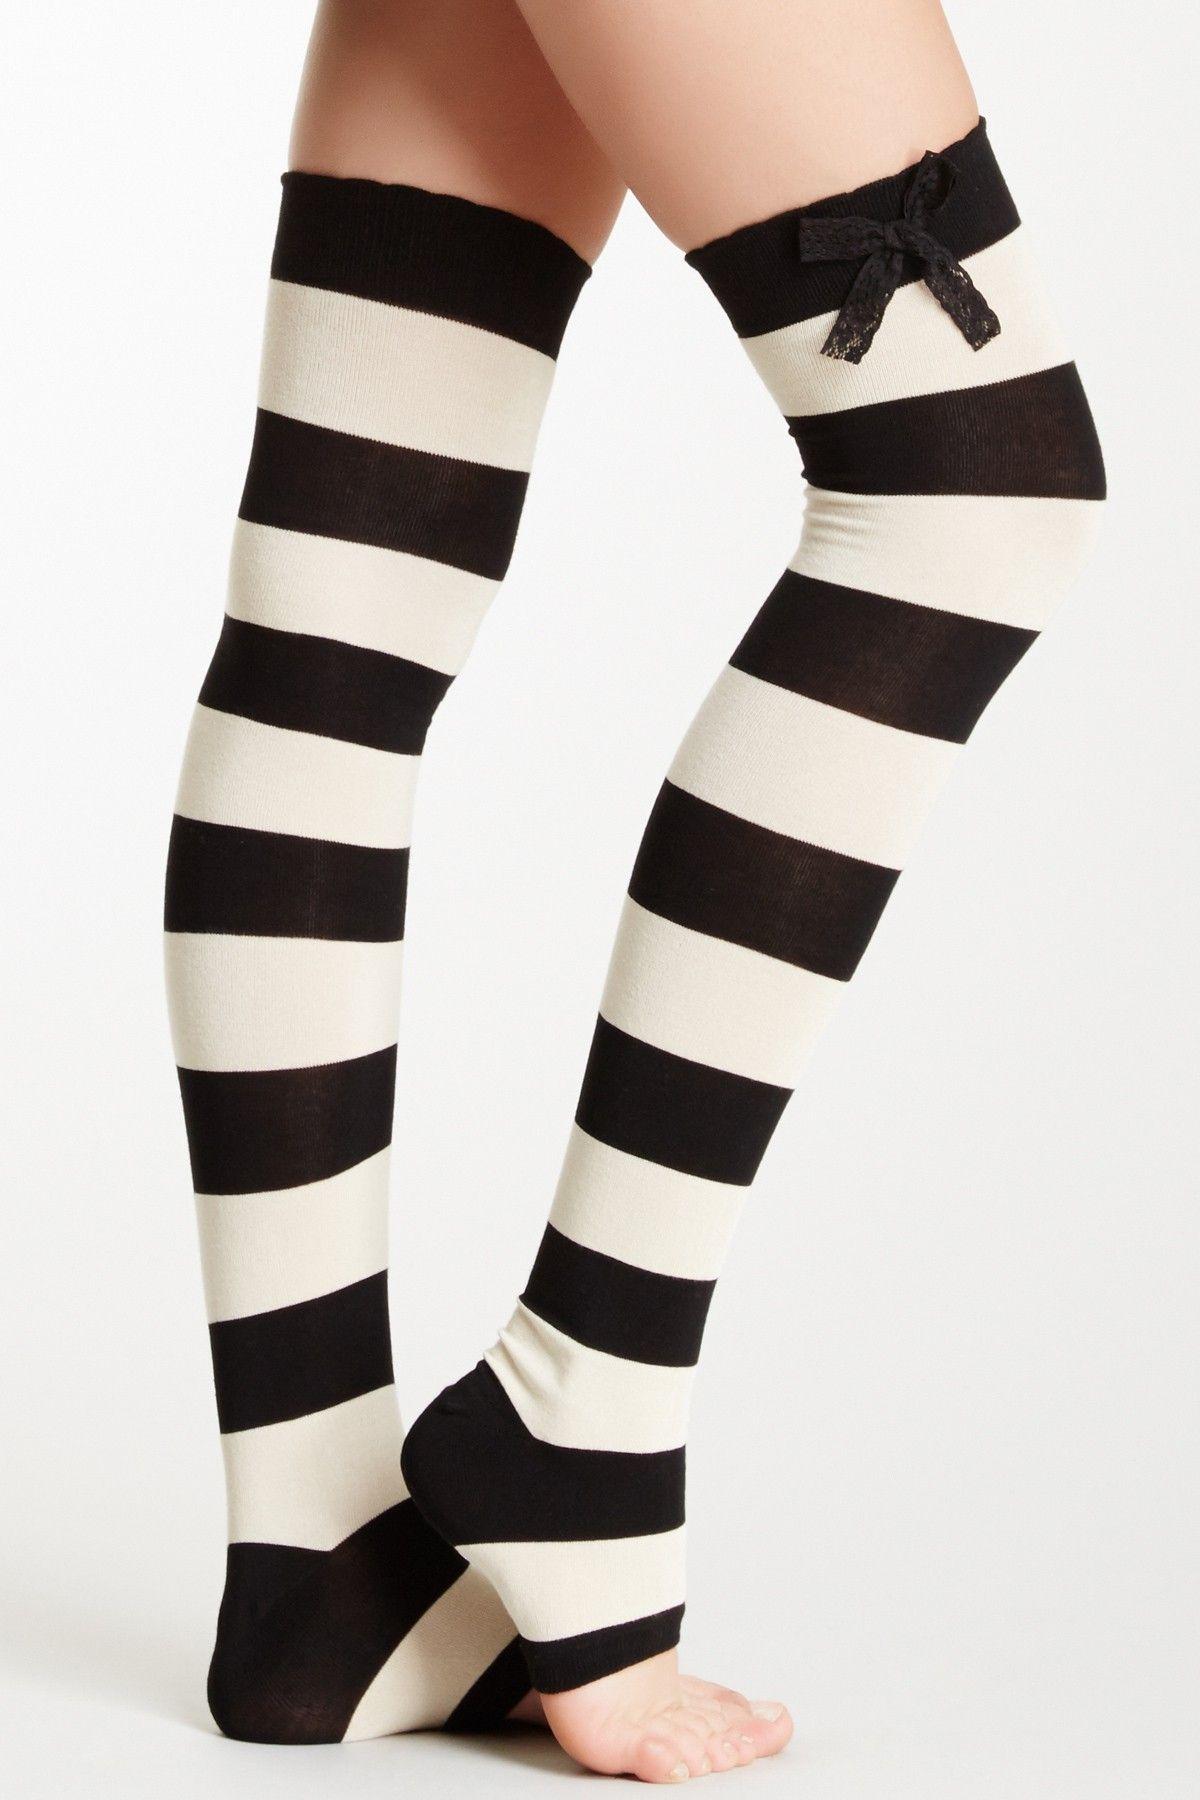 f23d09f15d4 Banded Stirrup Over-the-Knee Sock